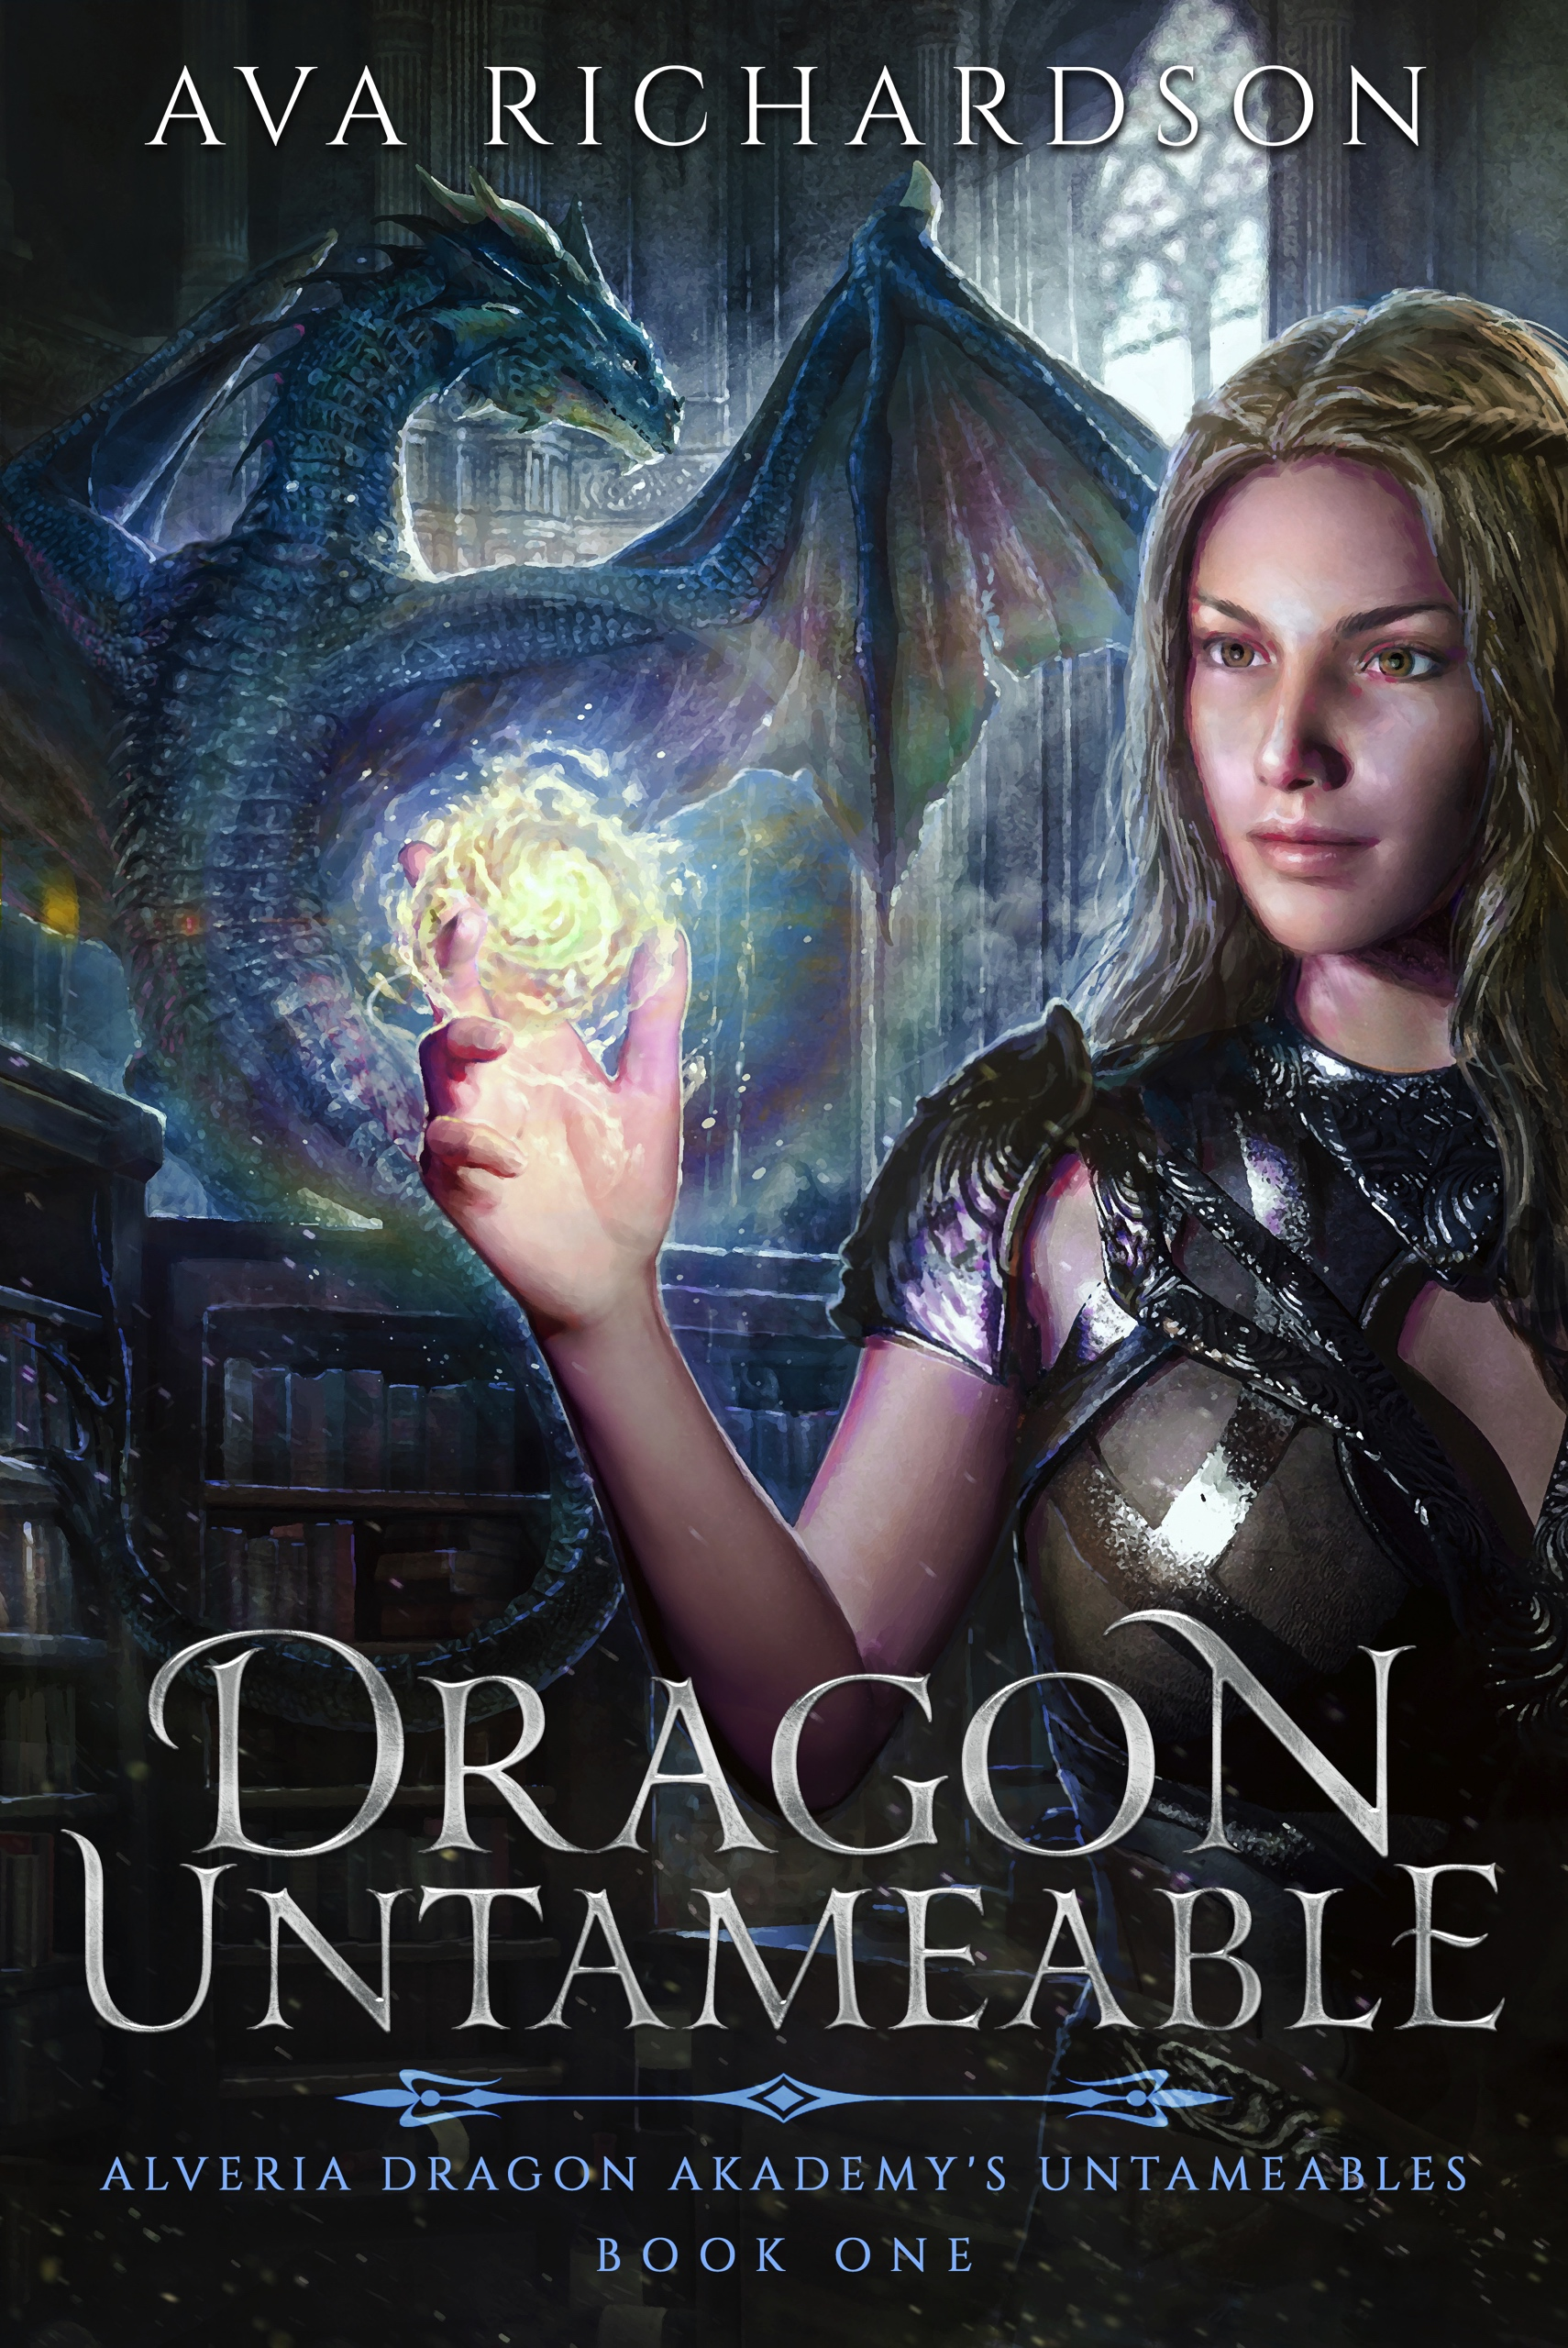 Alveria Dragon Akademy's Untameables Book 1